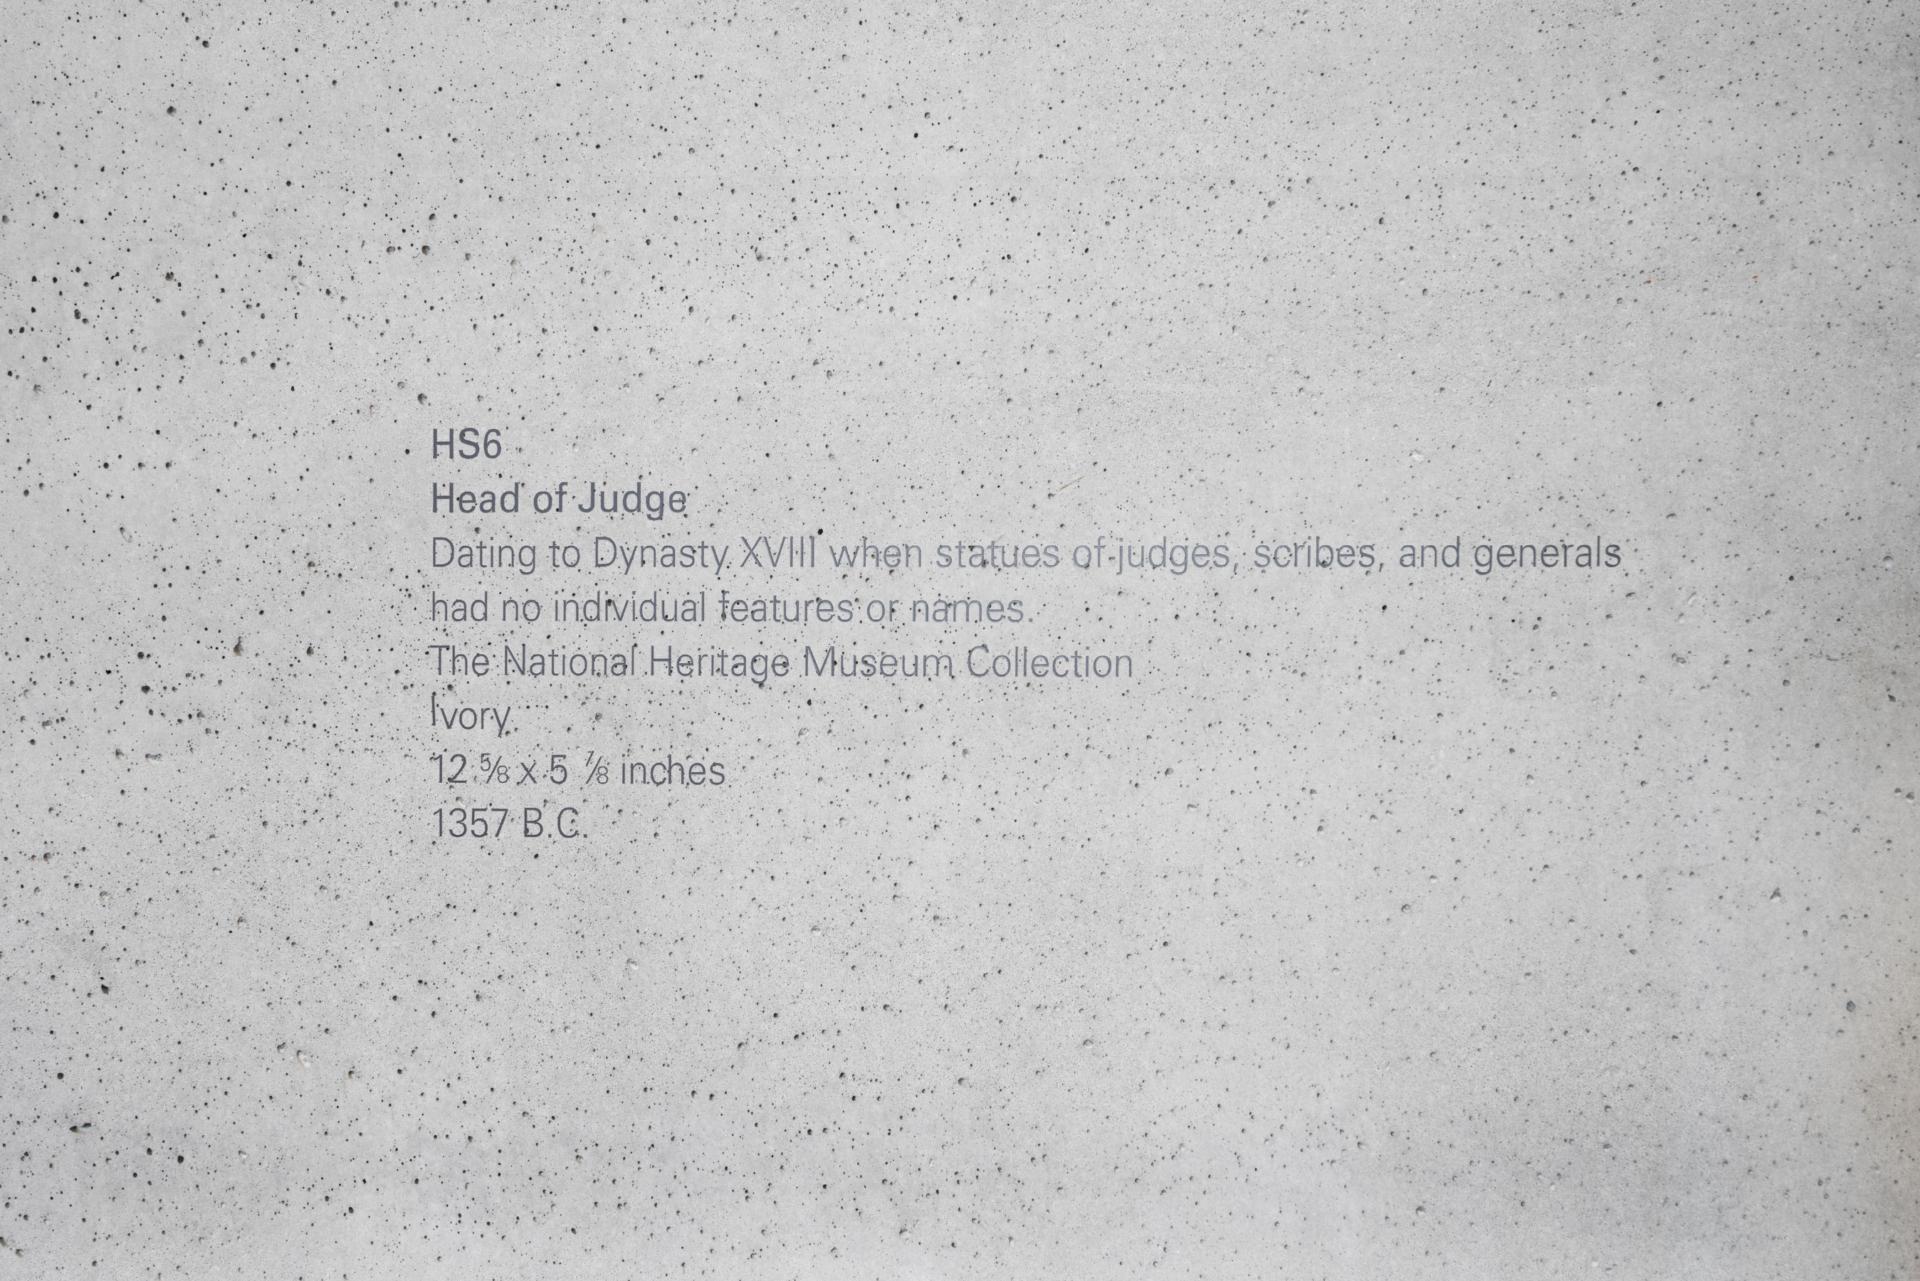 STUDIO  LHOOQ Iman Issa: Heritage Studies